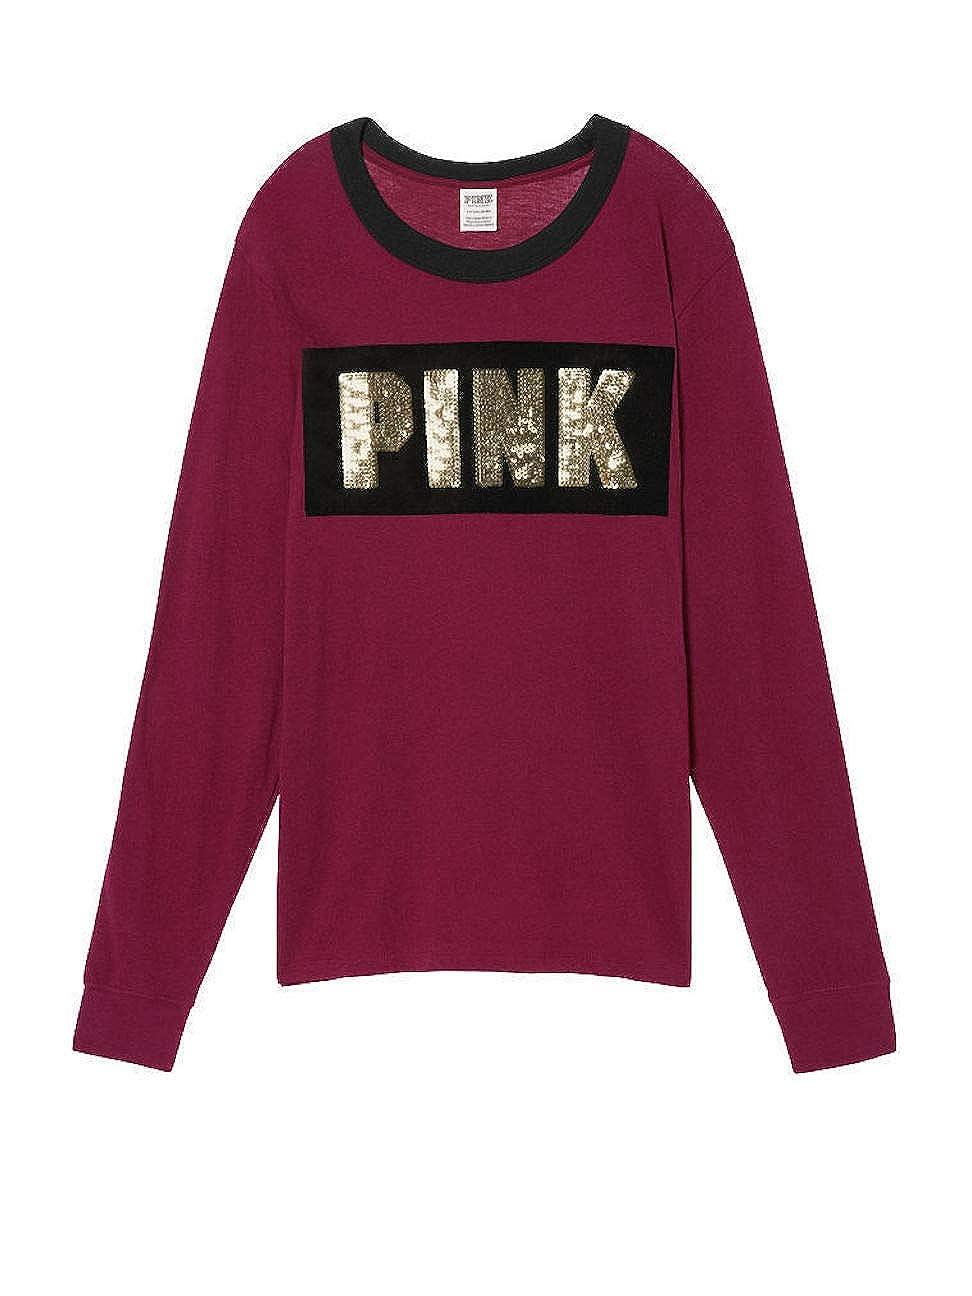 Victorias Secret Pink Bling Campus Long Sleeve Pocket T-Shirt Medium Black Orchid